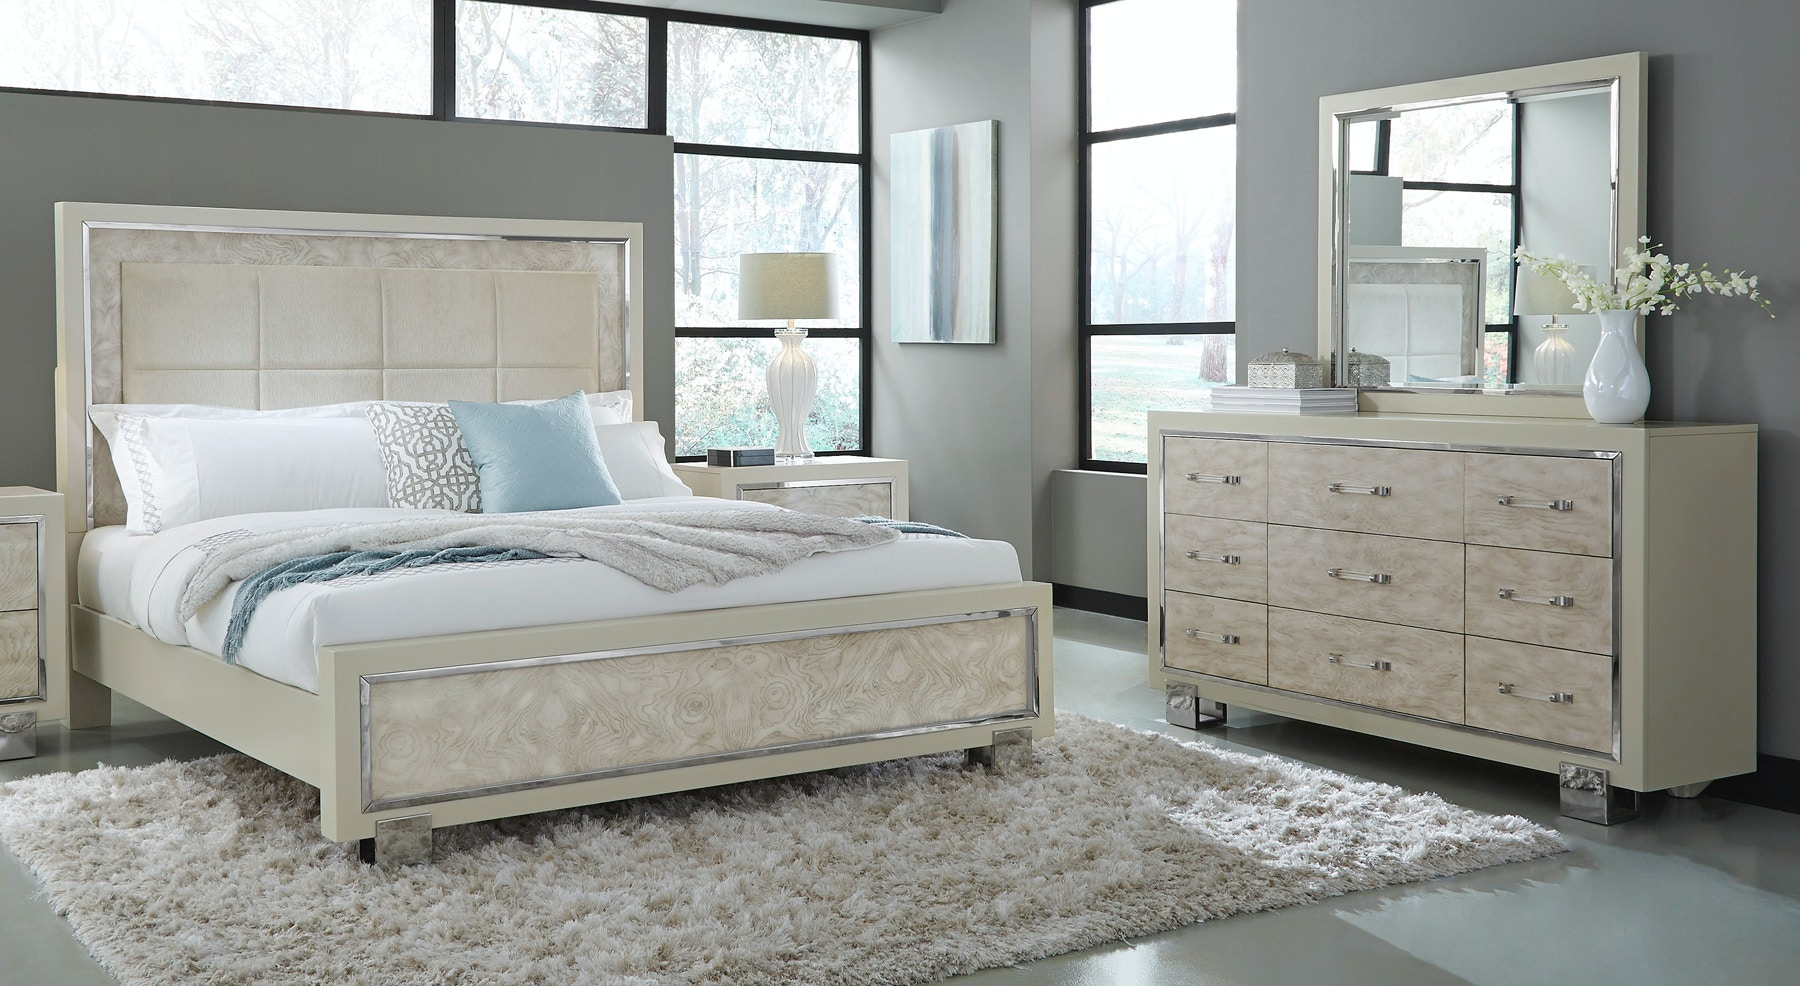 Pulaski Furniture Cydney Bedroom Group   King 812765   Furniture Fair    Cincinnati U0026 Dayton OH And Northern KY